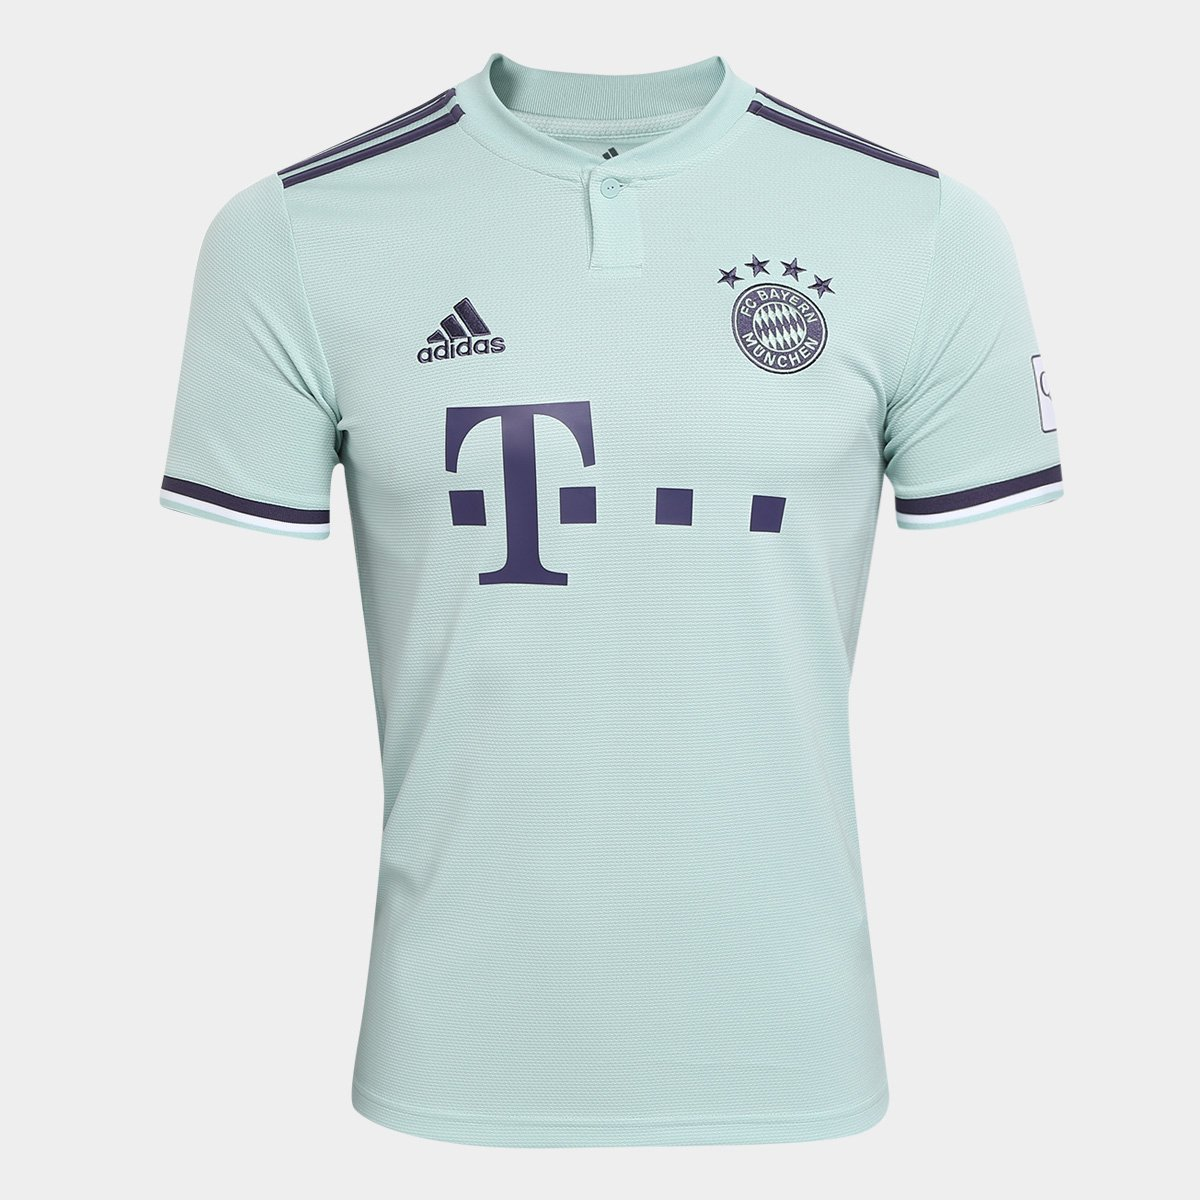 Camisa Bayern de Munique Away 2018 s n° - Torcedor Adidas Masculina ... 0c8d0887c0615